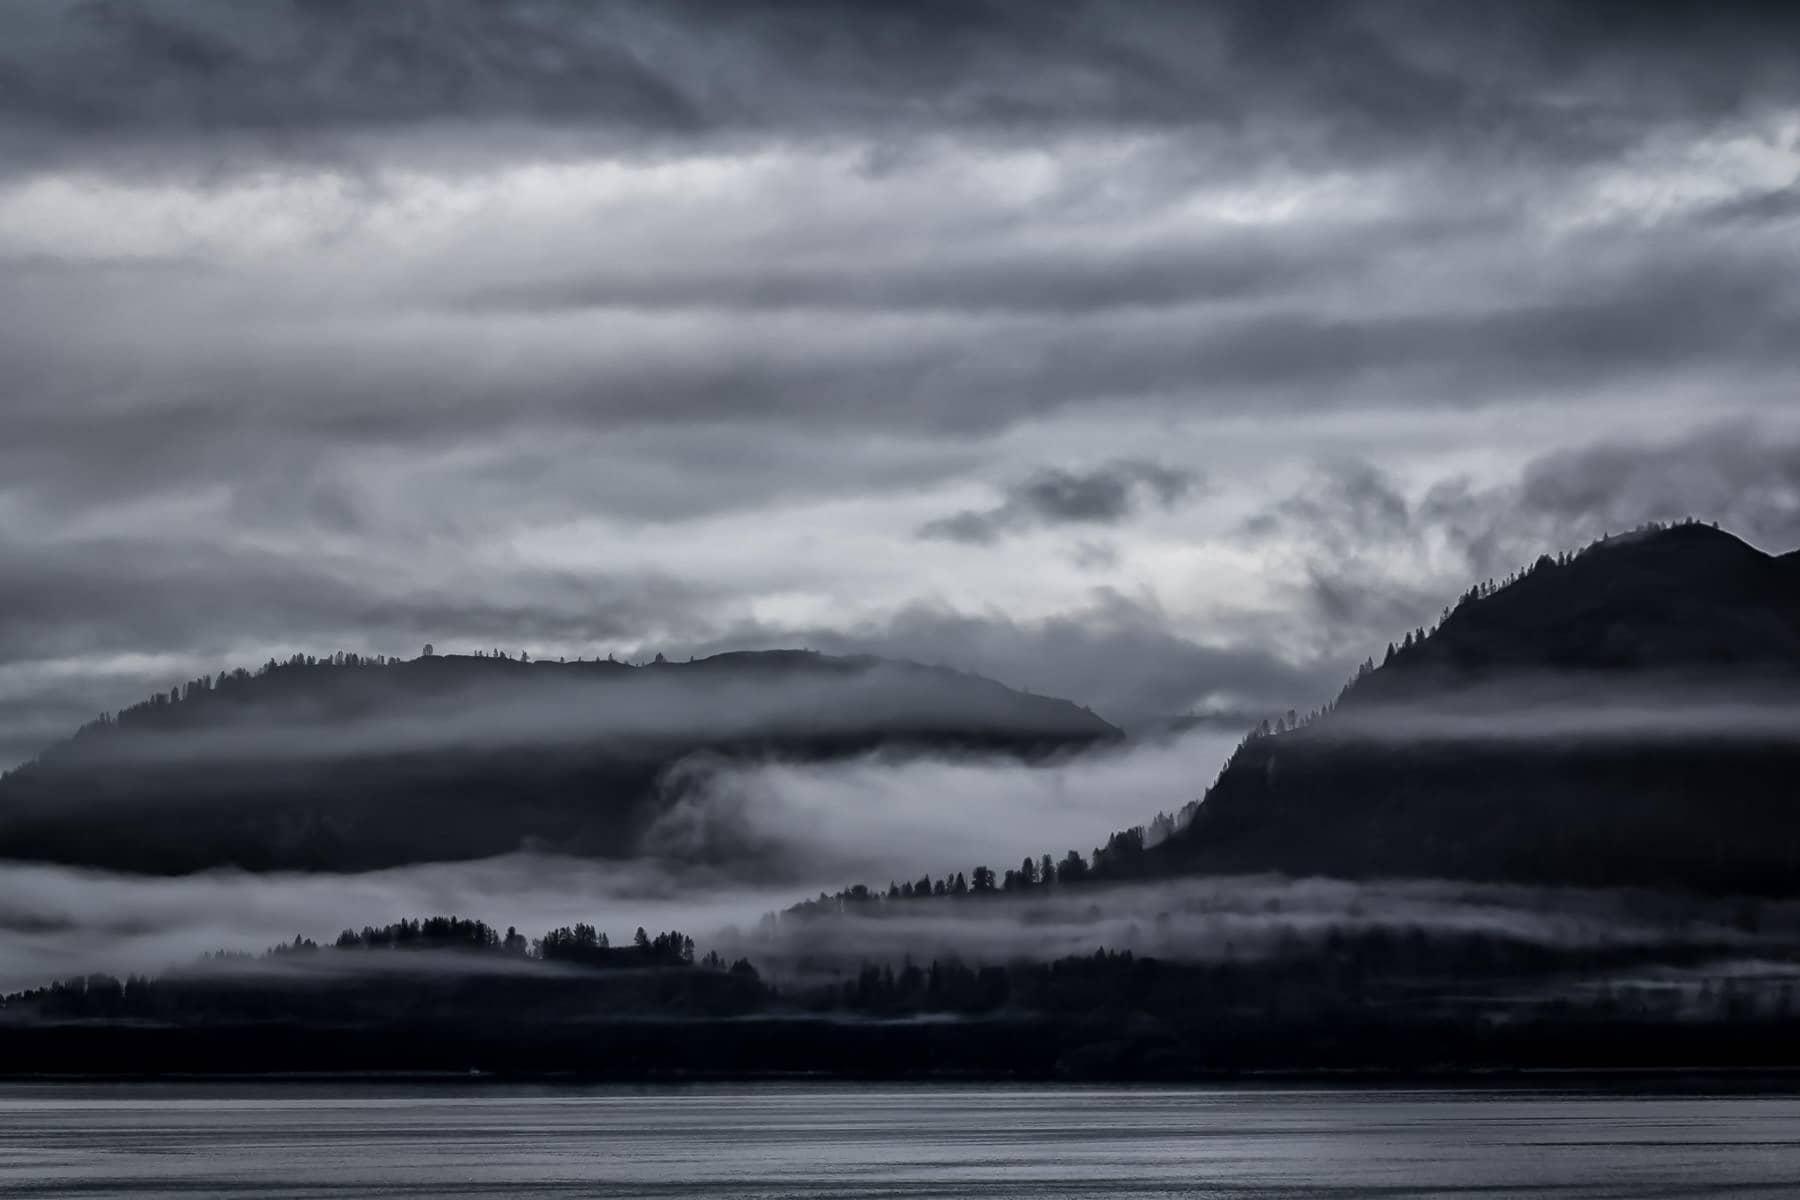 A fog-shrouded island seems to be full of mystery in Alaska's Glacier Bay National Park.